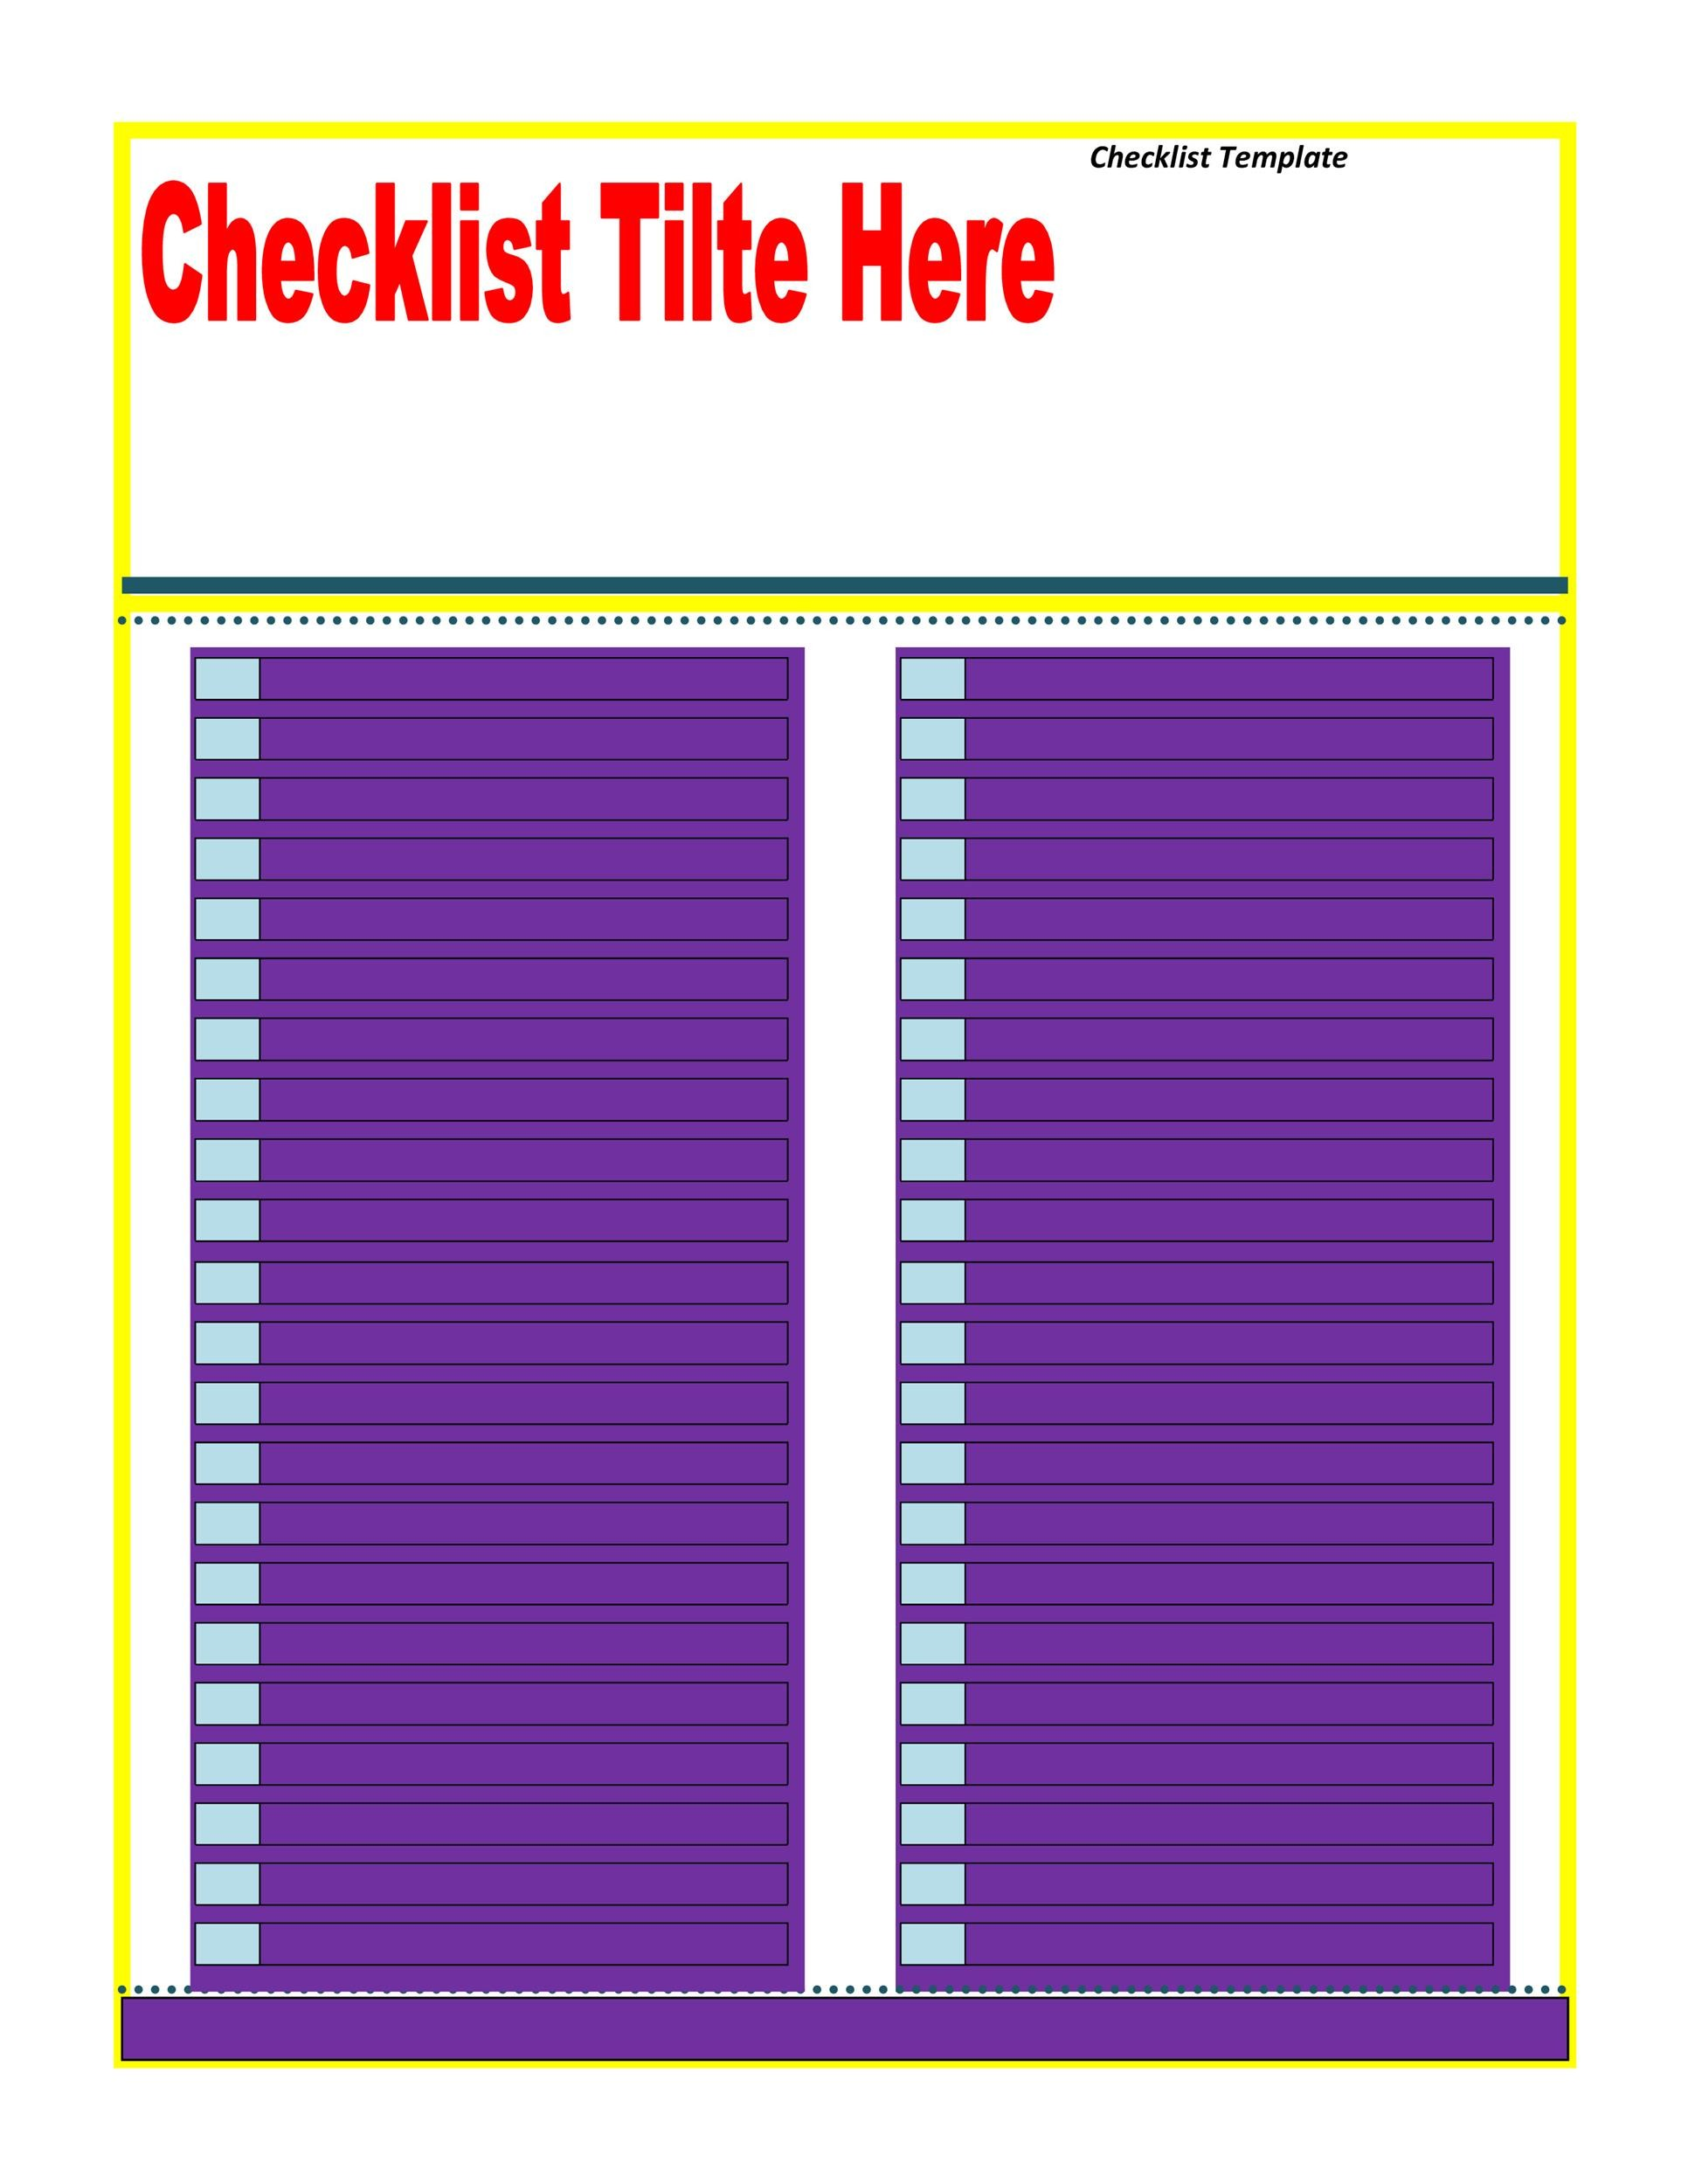 Checklist Template 06